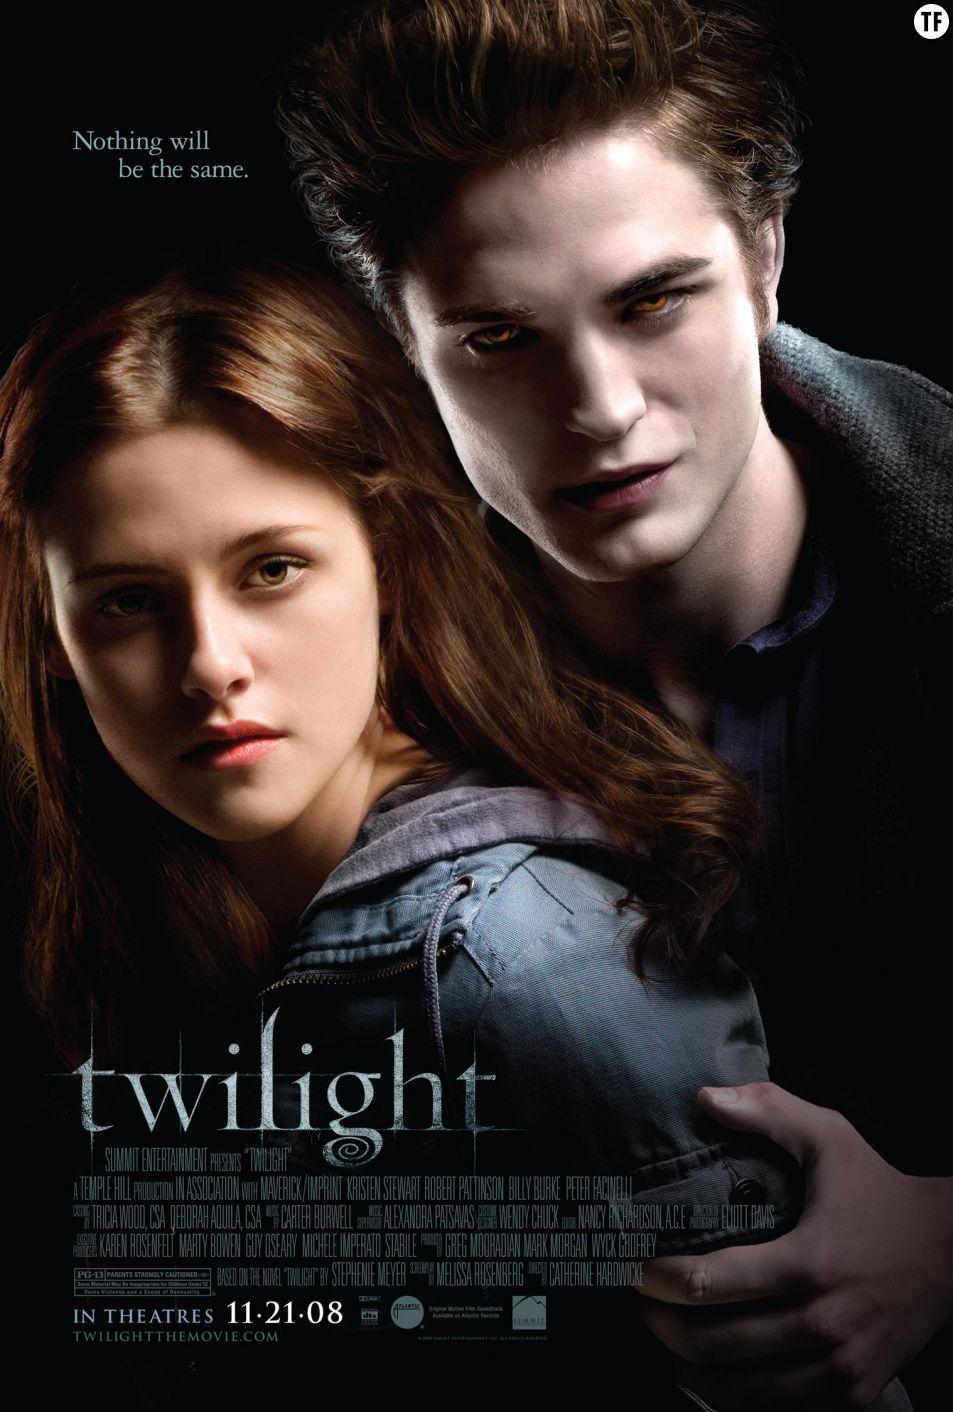 Twilight 6 Robert Pattinson Et Kristen Stewart Bientot De Retour Terrafemina